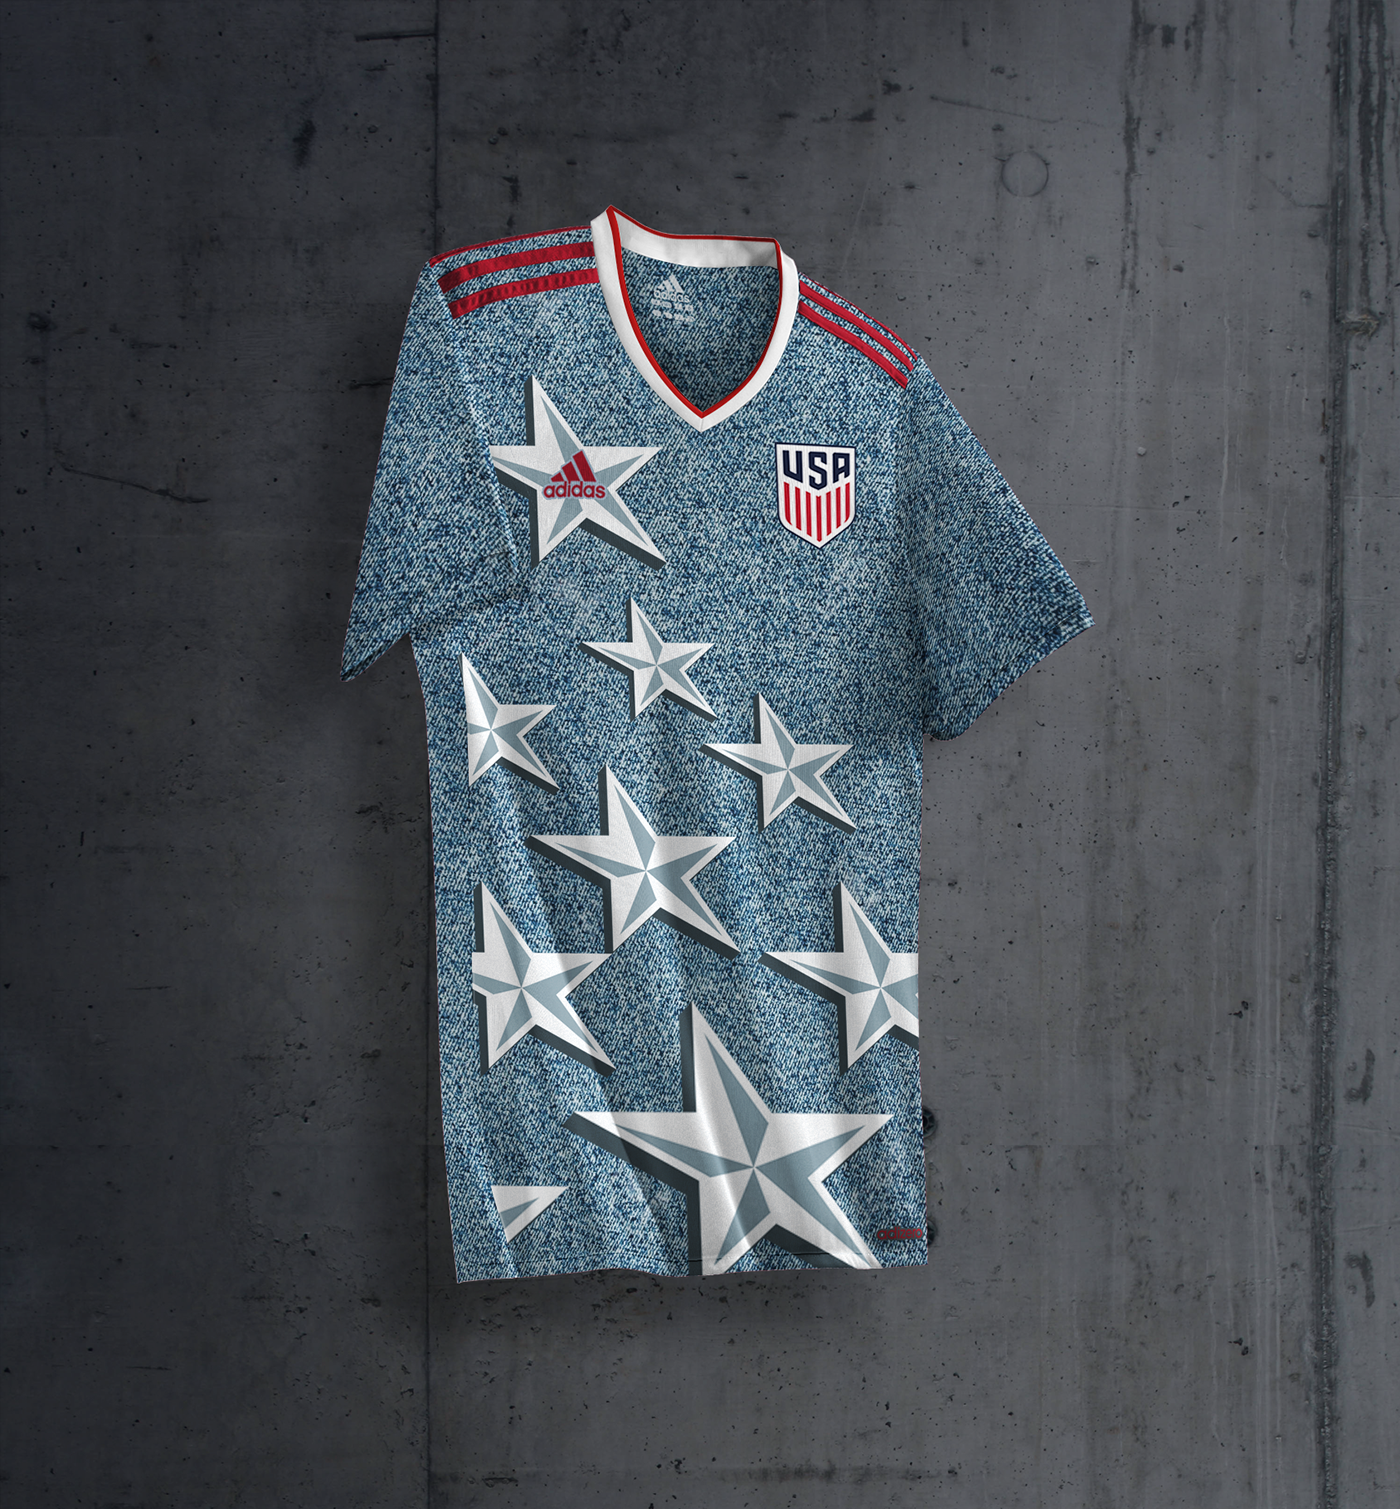 Talisman & Co. | USA Concept Kit